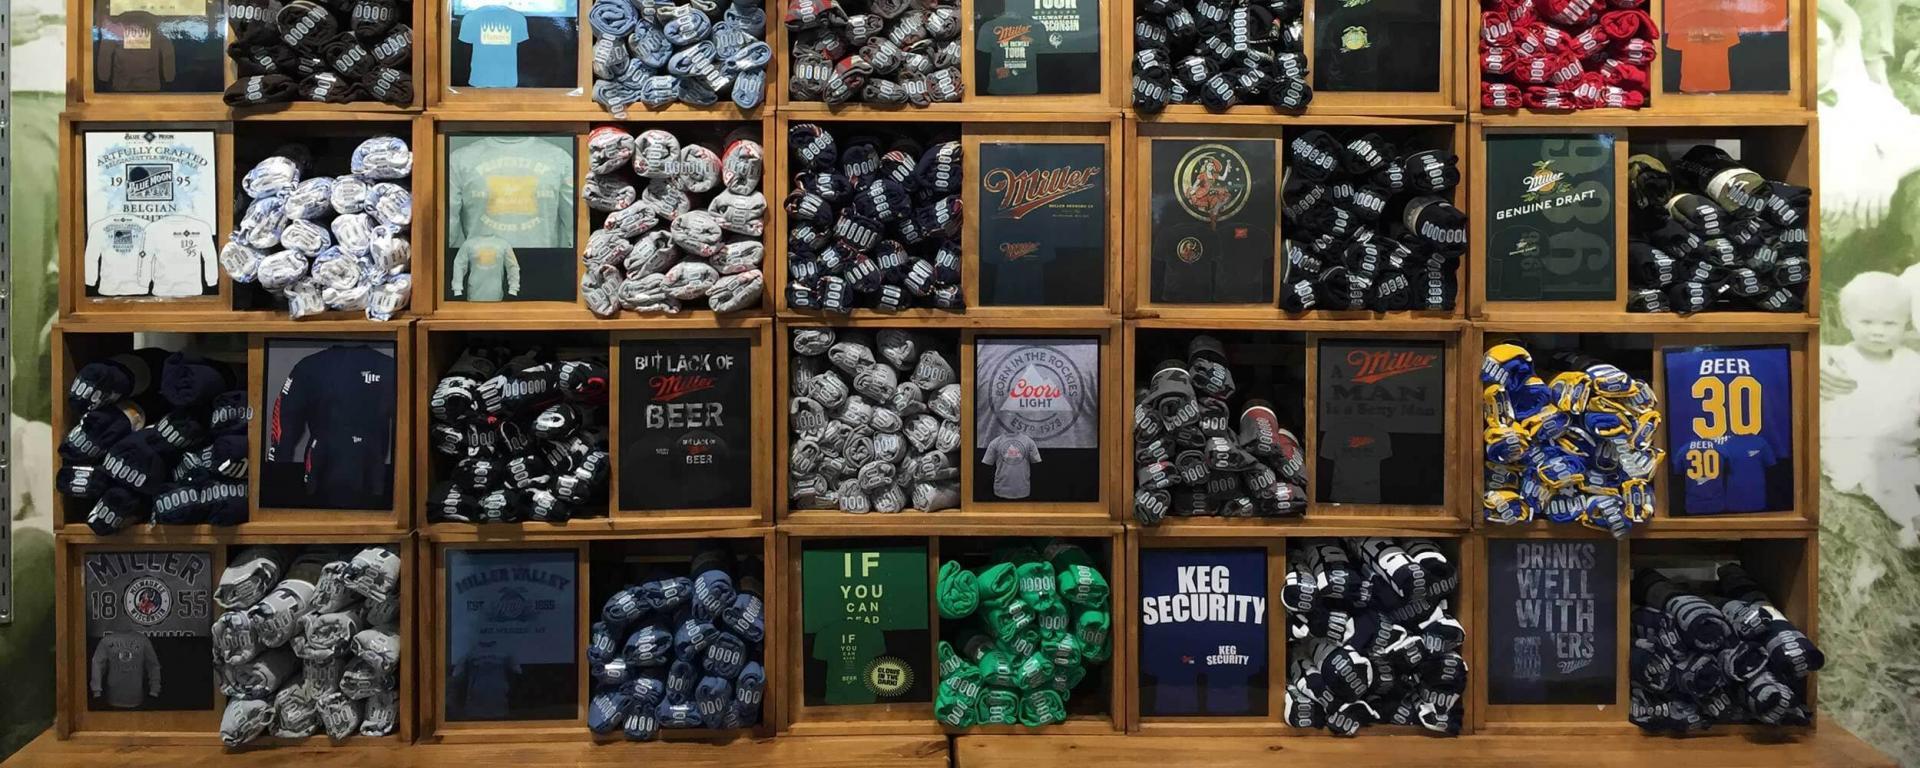 milwaukee tours gift shop t-shirt display